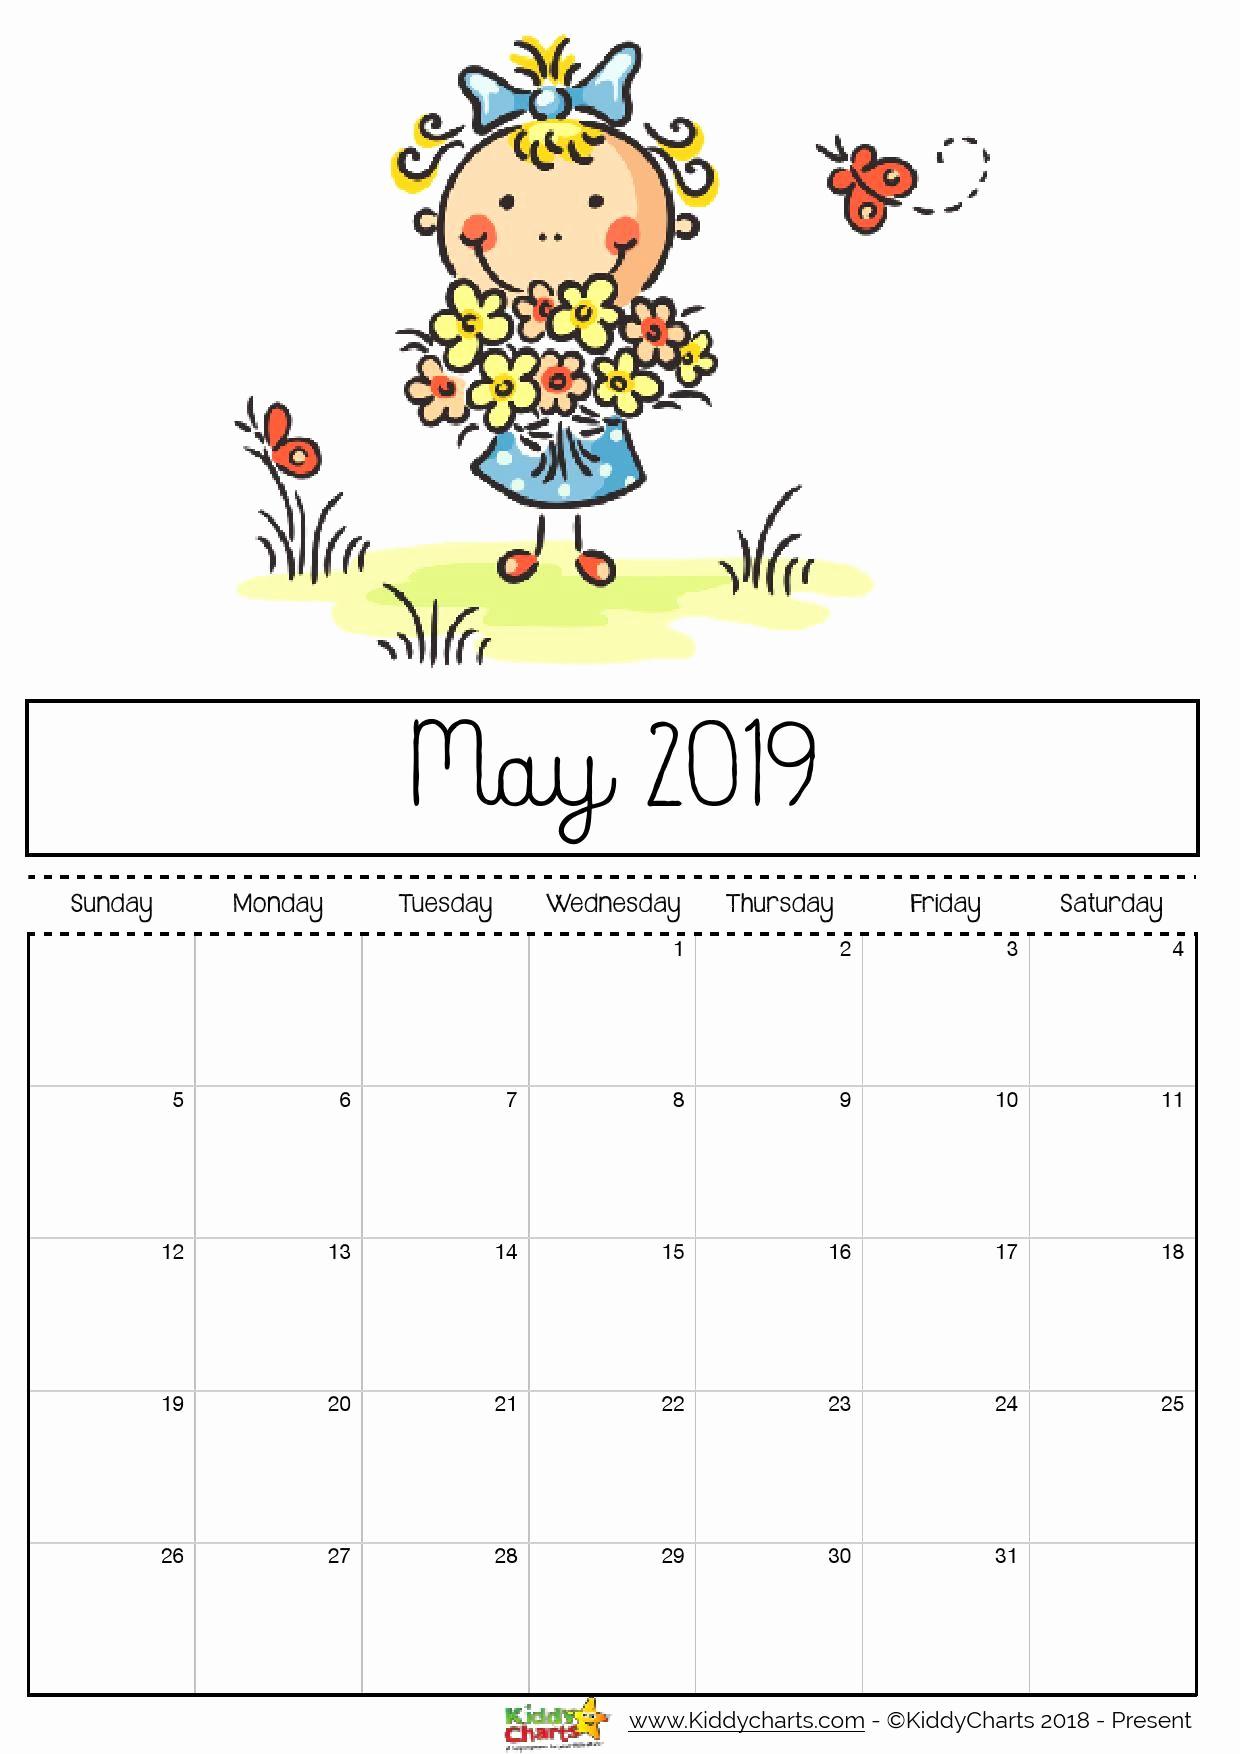 May 2019 Cute Calendar for Kids